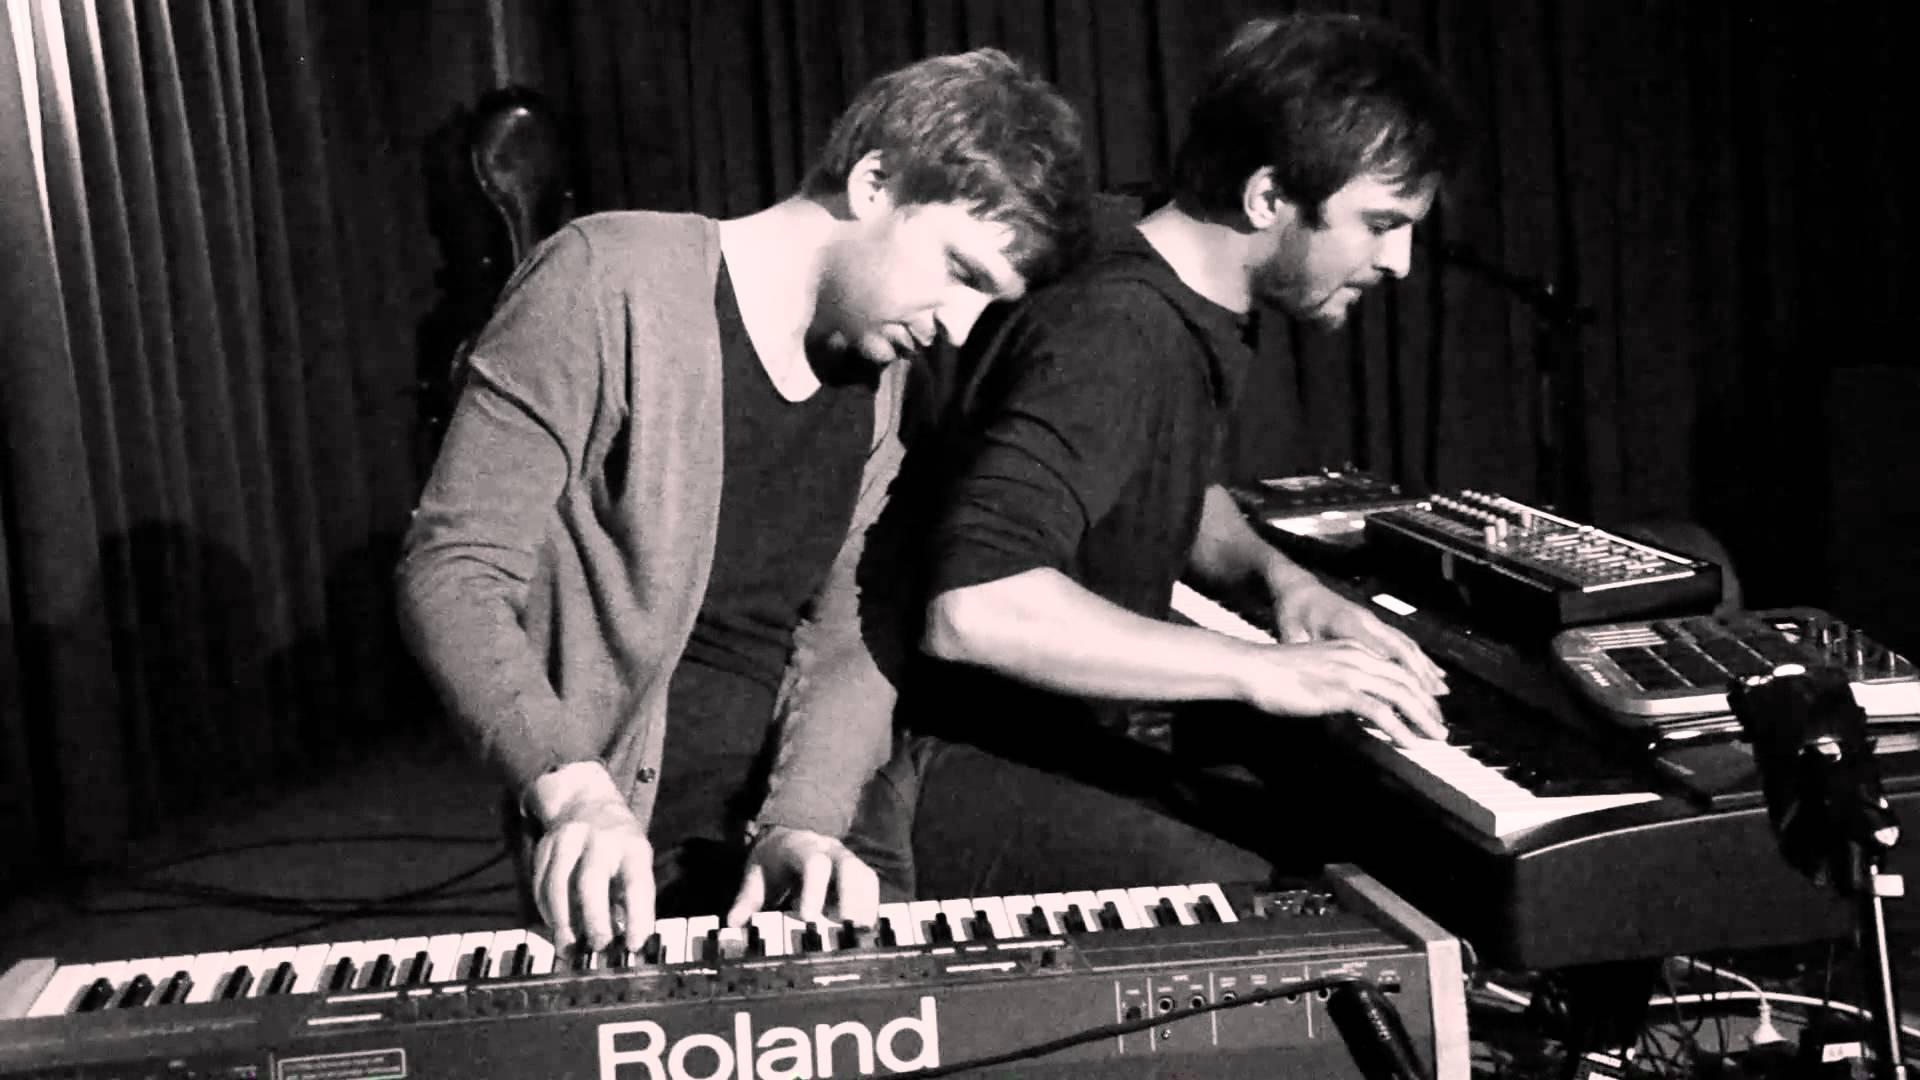 Ólafur Arnalds & Nils Frahm | Live at Roter Salon